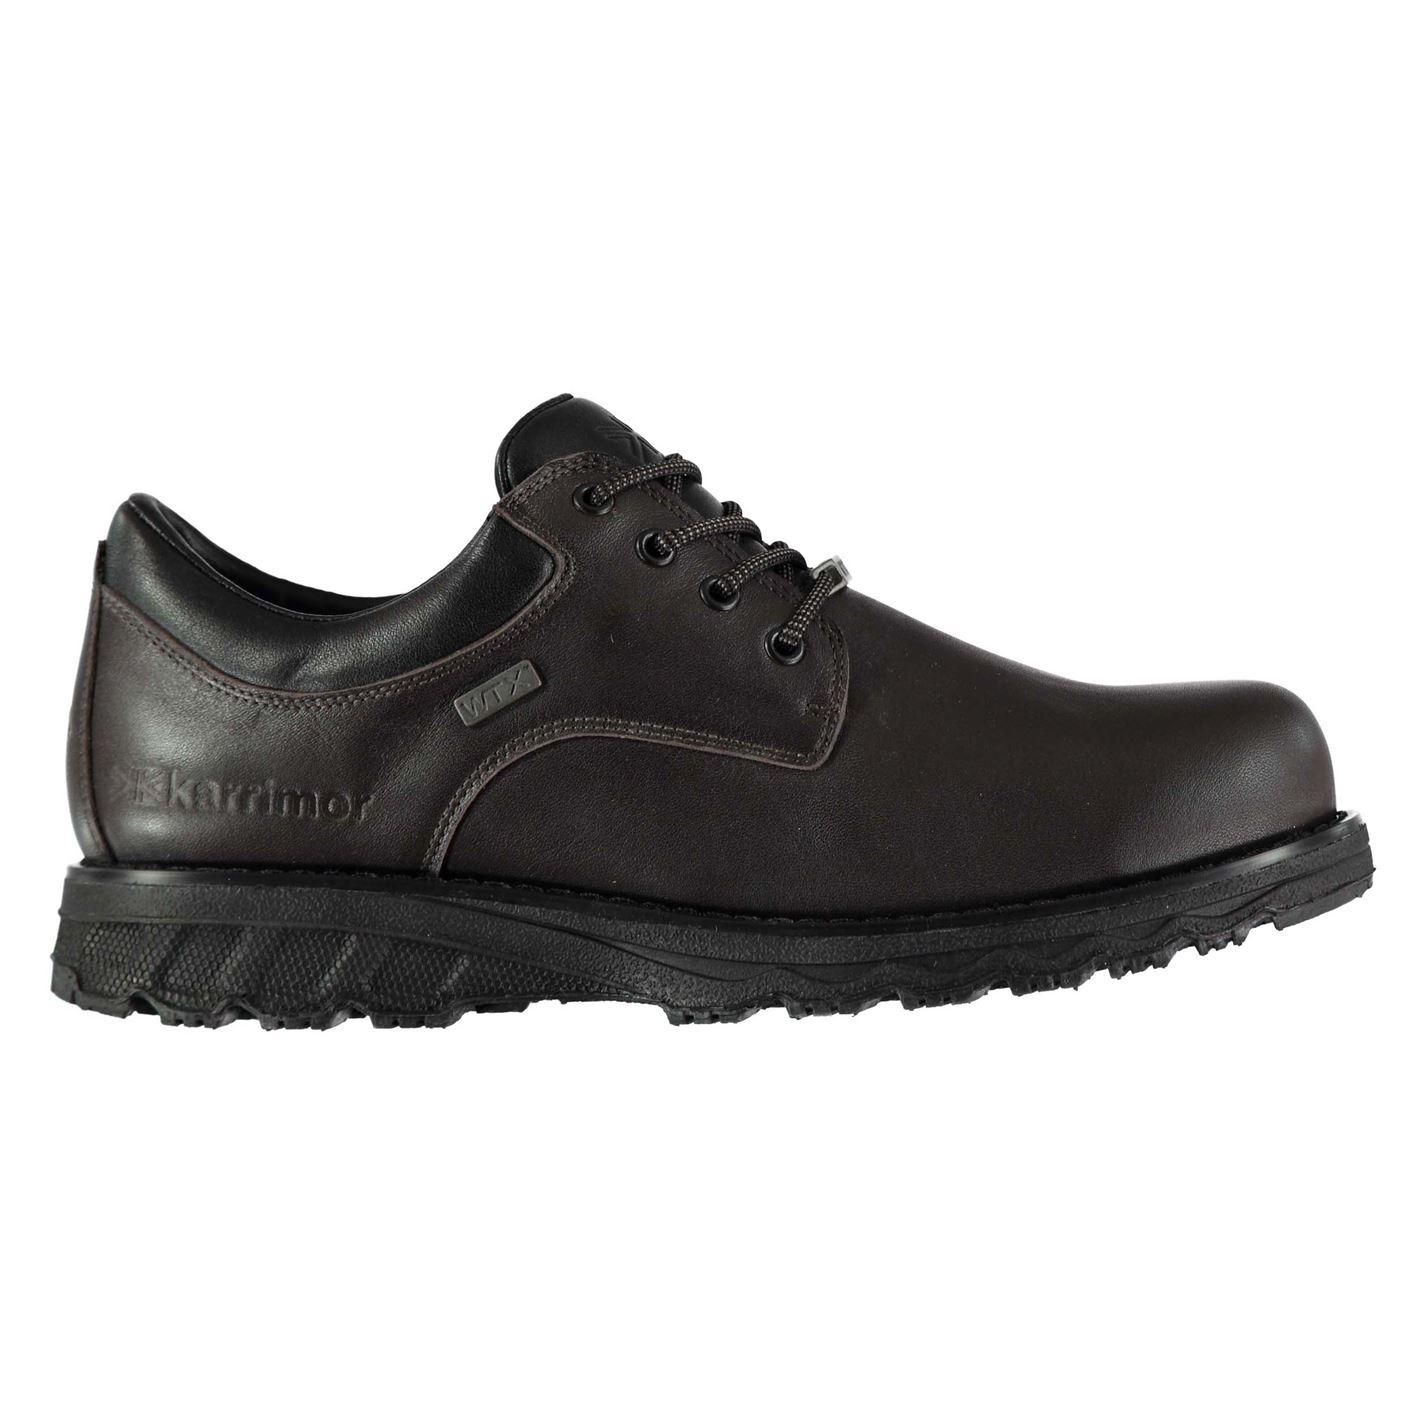 Karrimor Gorge WTX Mens Walking Shoes